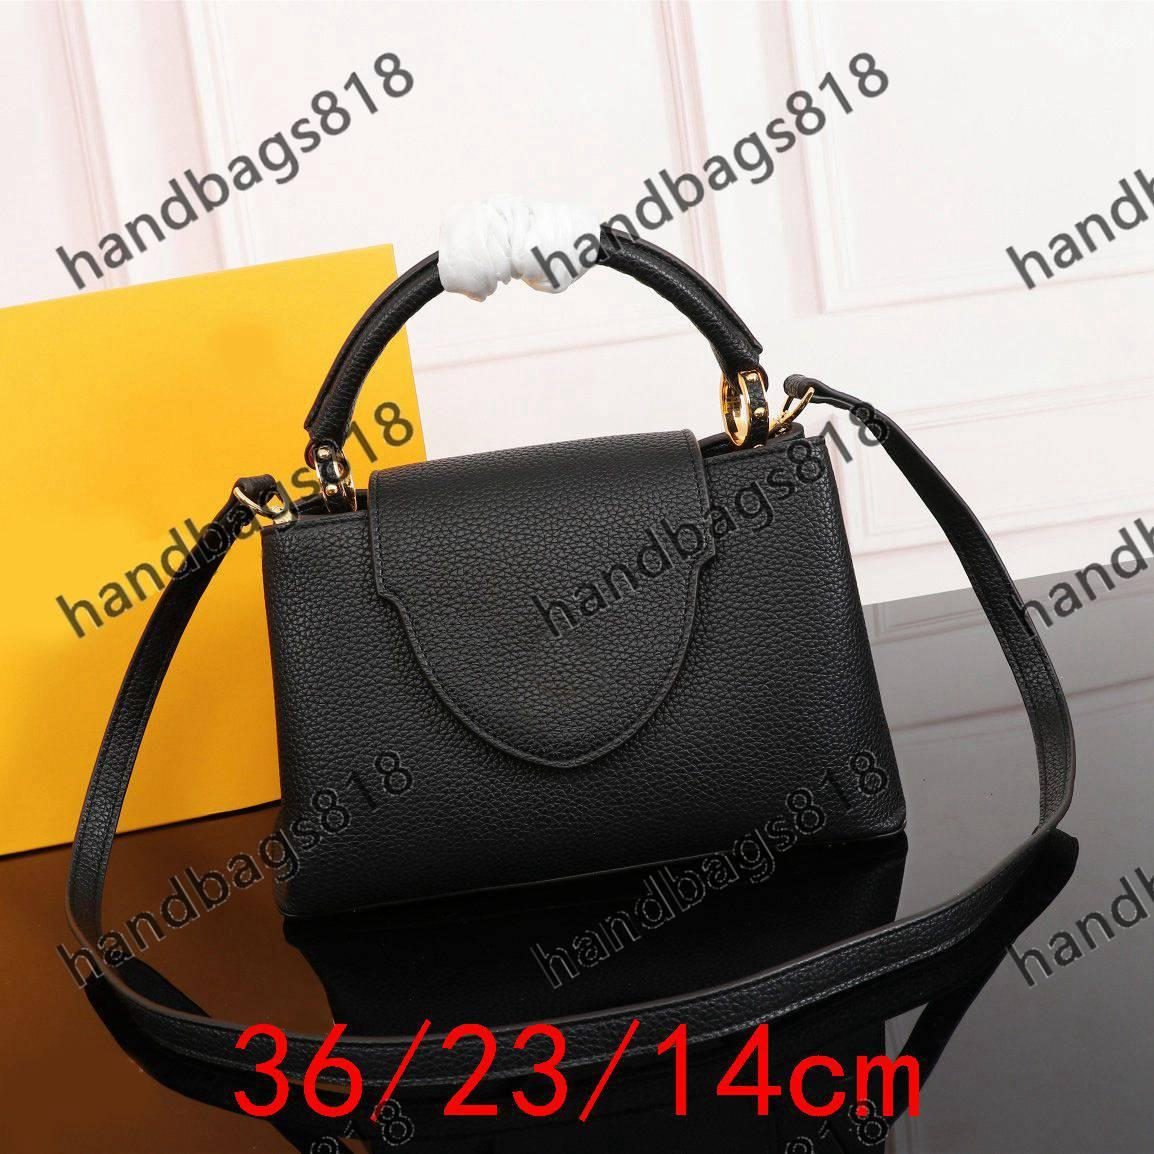 Totes Mesdames Classic Fashions Fashions Tempérament Crossbody 2021 Beautiful Mode Sacs fourre-tout Sacs à main en cuir de voyage Handbag 919 Lady Sac Femmes FC04-06